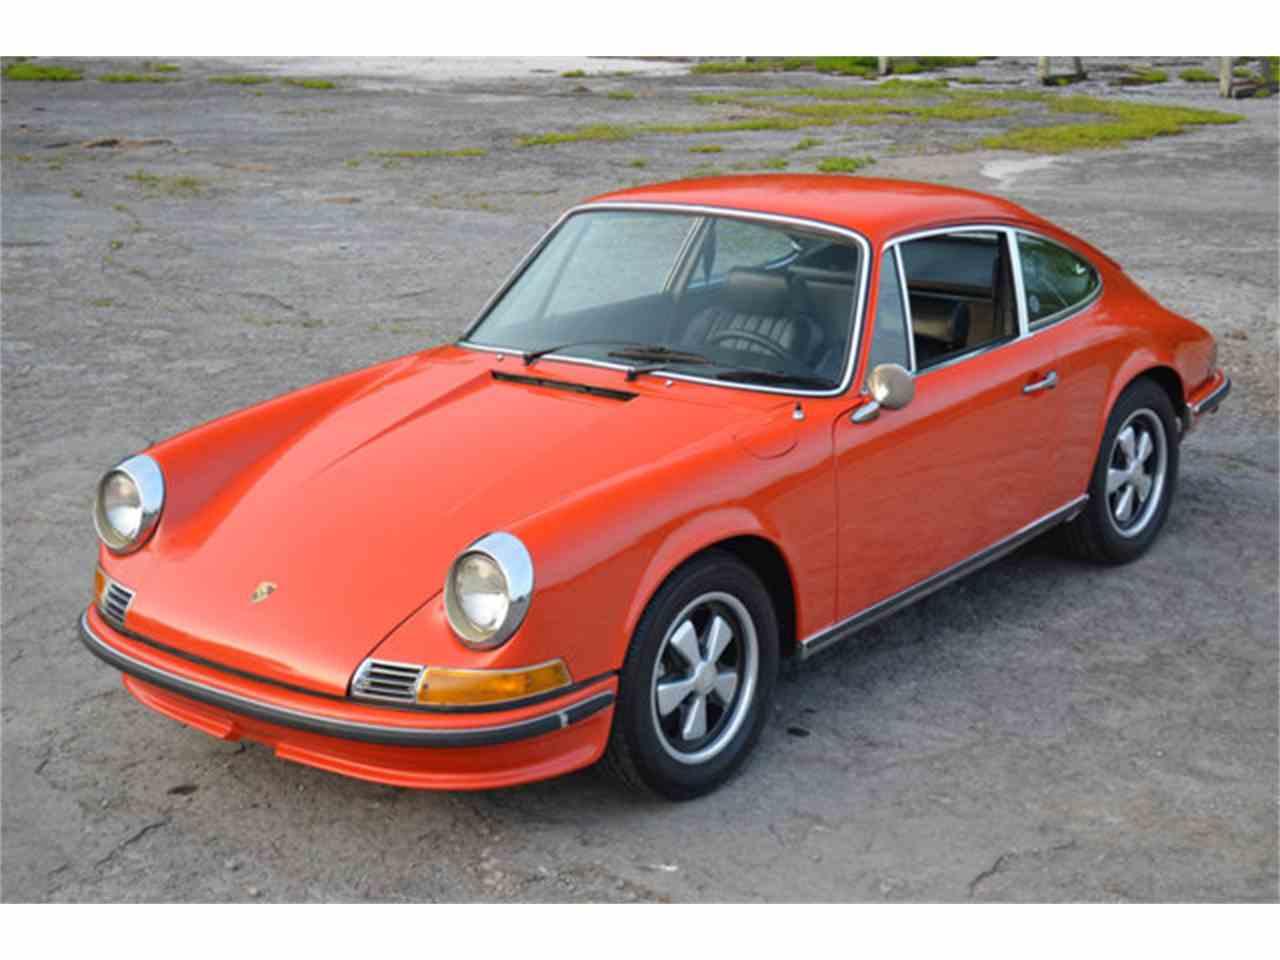 Two Clic 1978 Porsche 911 SC Up For Sale In Laredo Texas. 1974 ...